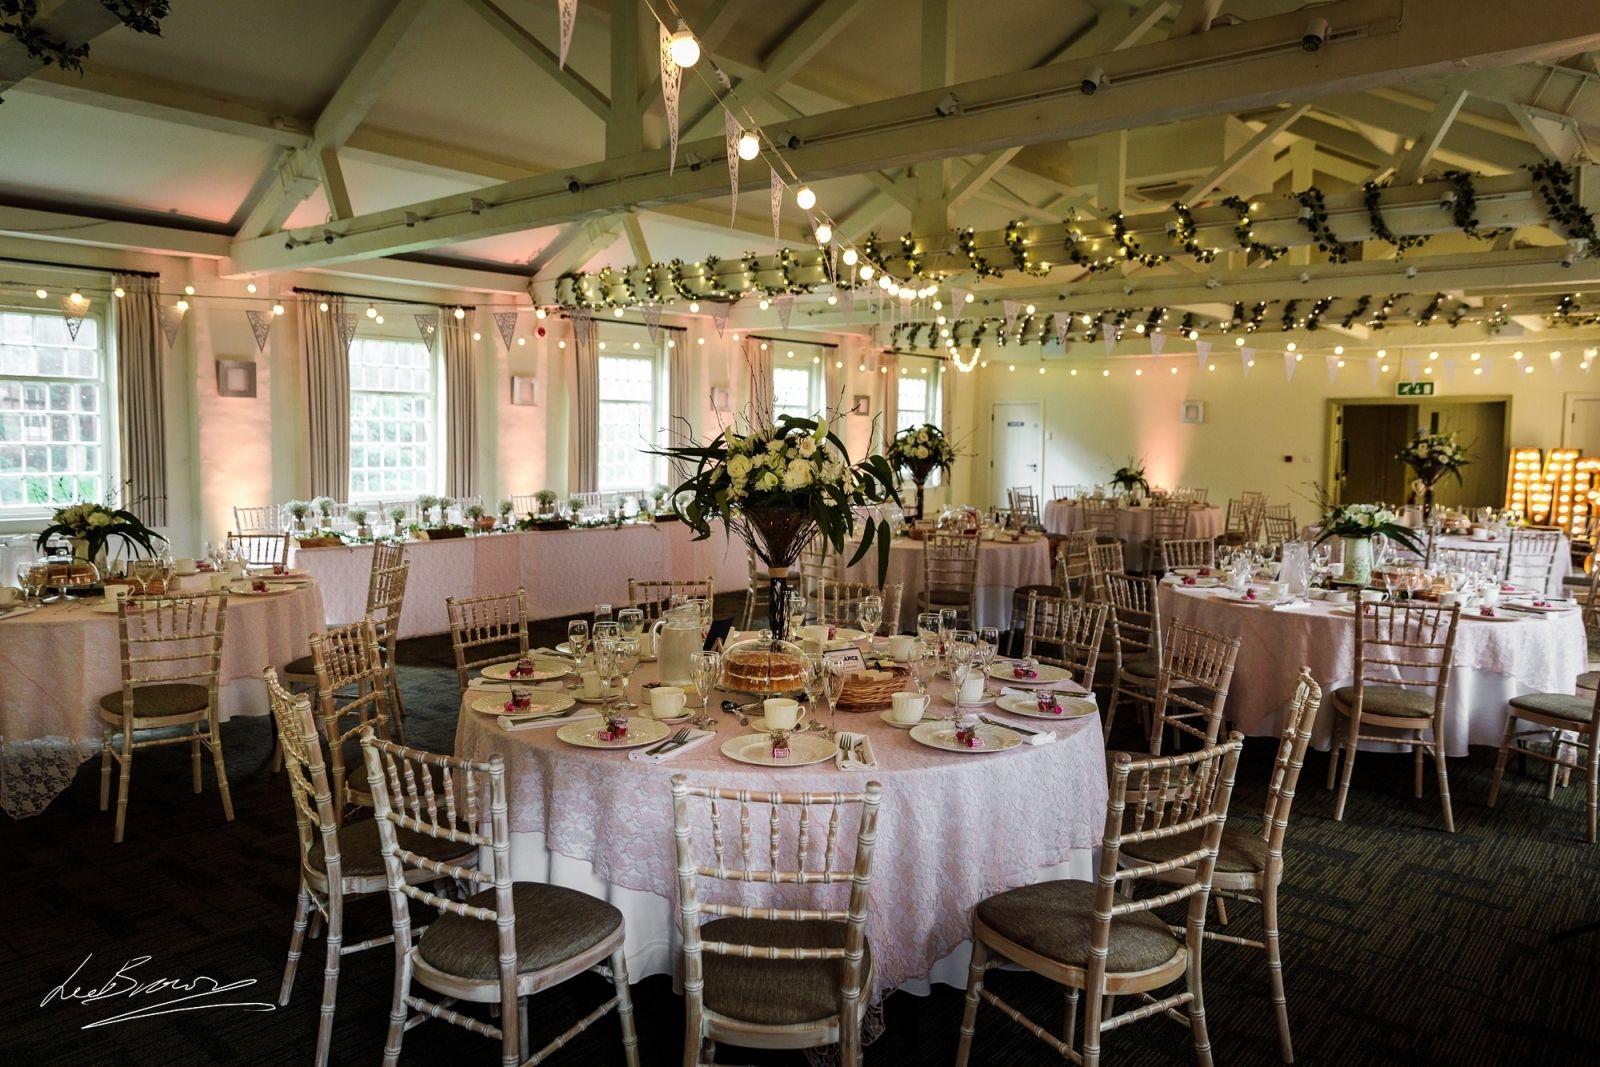 wedding reception venues north yorkshire%0A Bridesmaids and ushers group photos  Hay bales  Heaton House Farm Wedding  venue  Cheshire UK     Emilie May Photography   Cheshire Wedding Venues    Pinterest